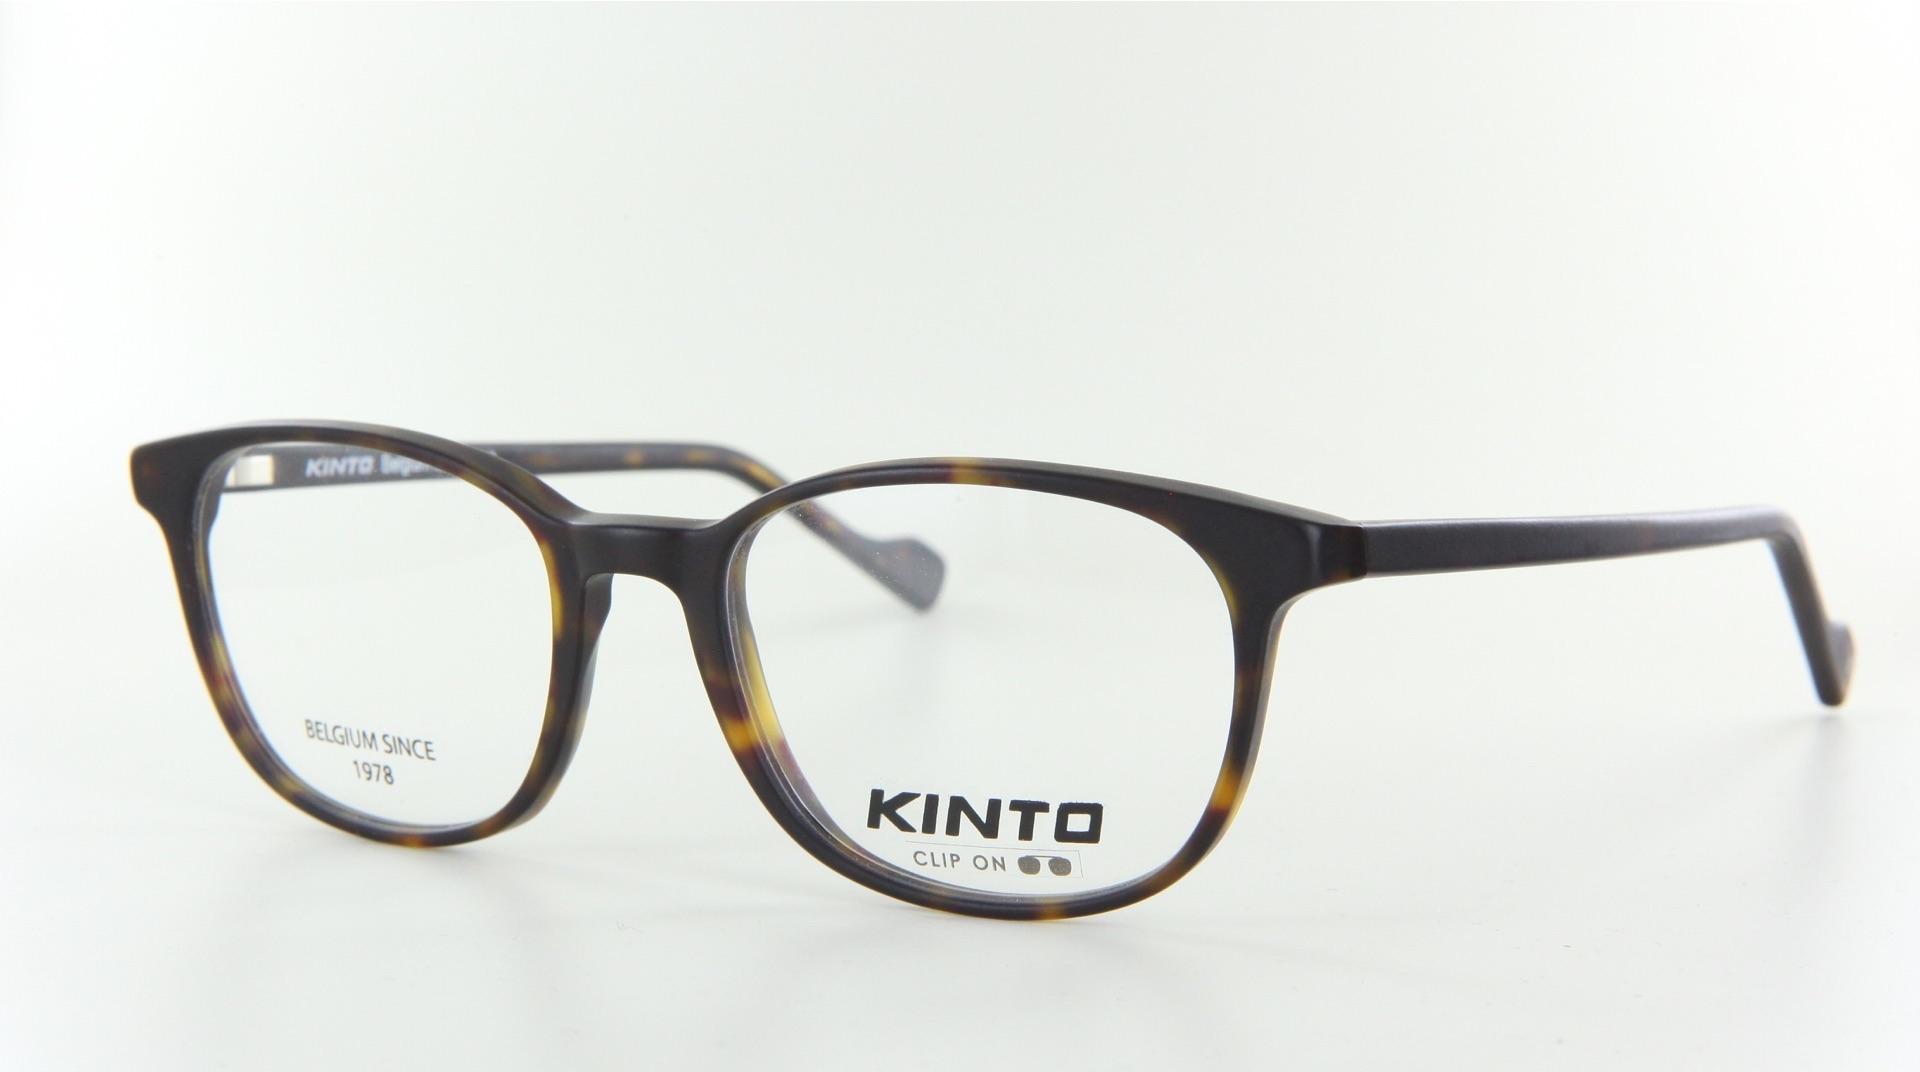 Kinto - ref: 72878